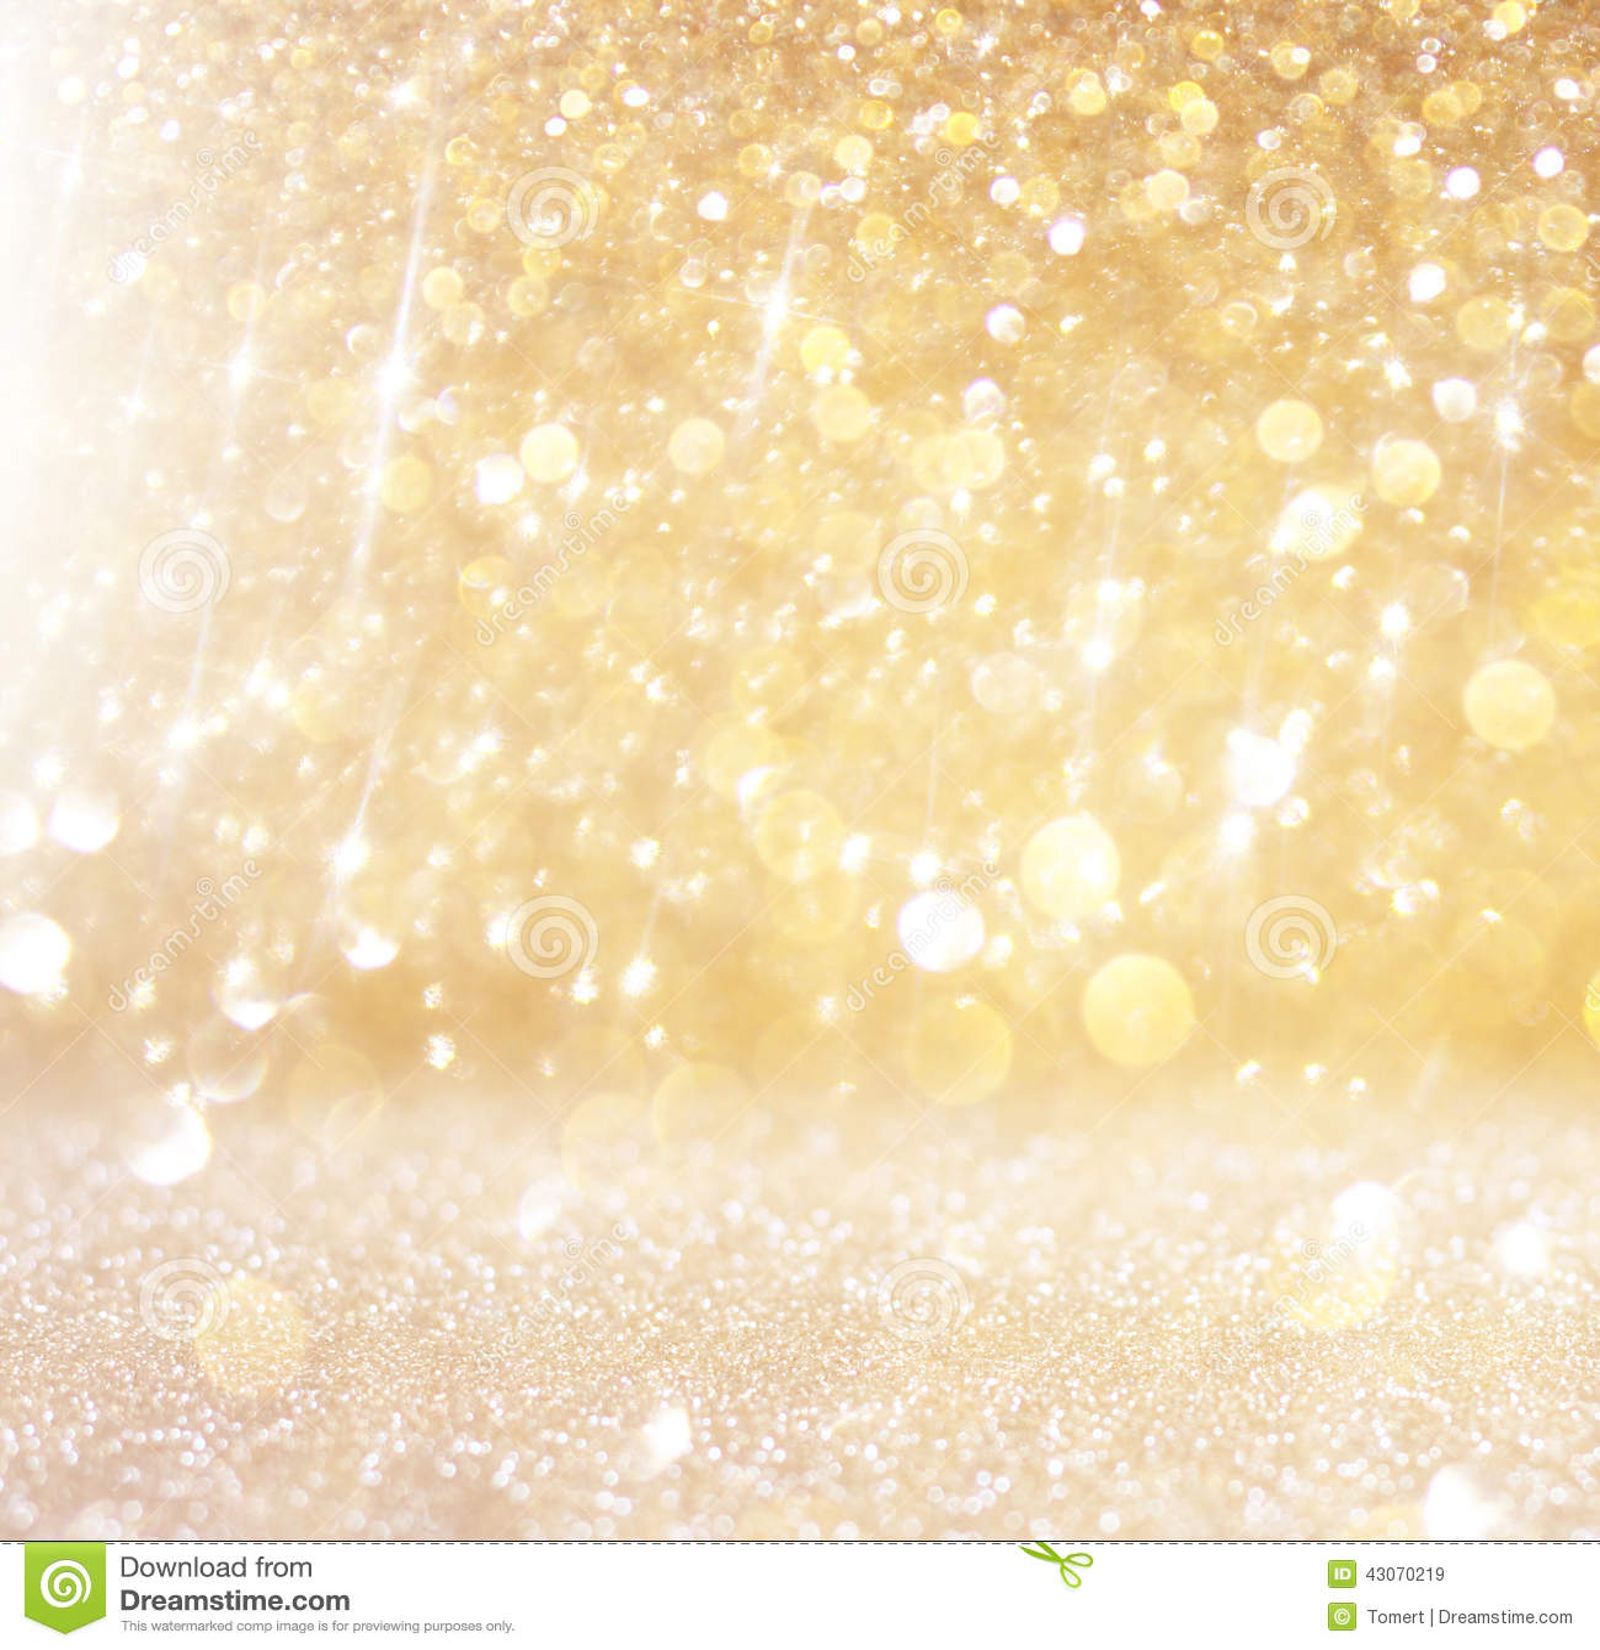 light gold vintage background - photo #9